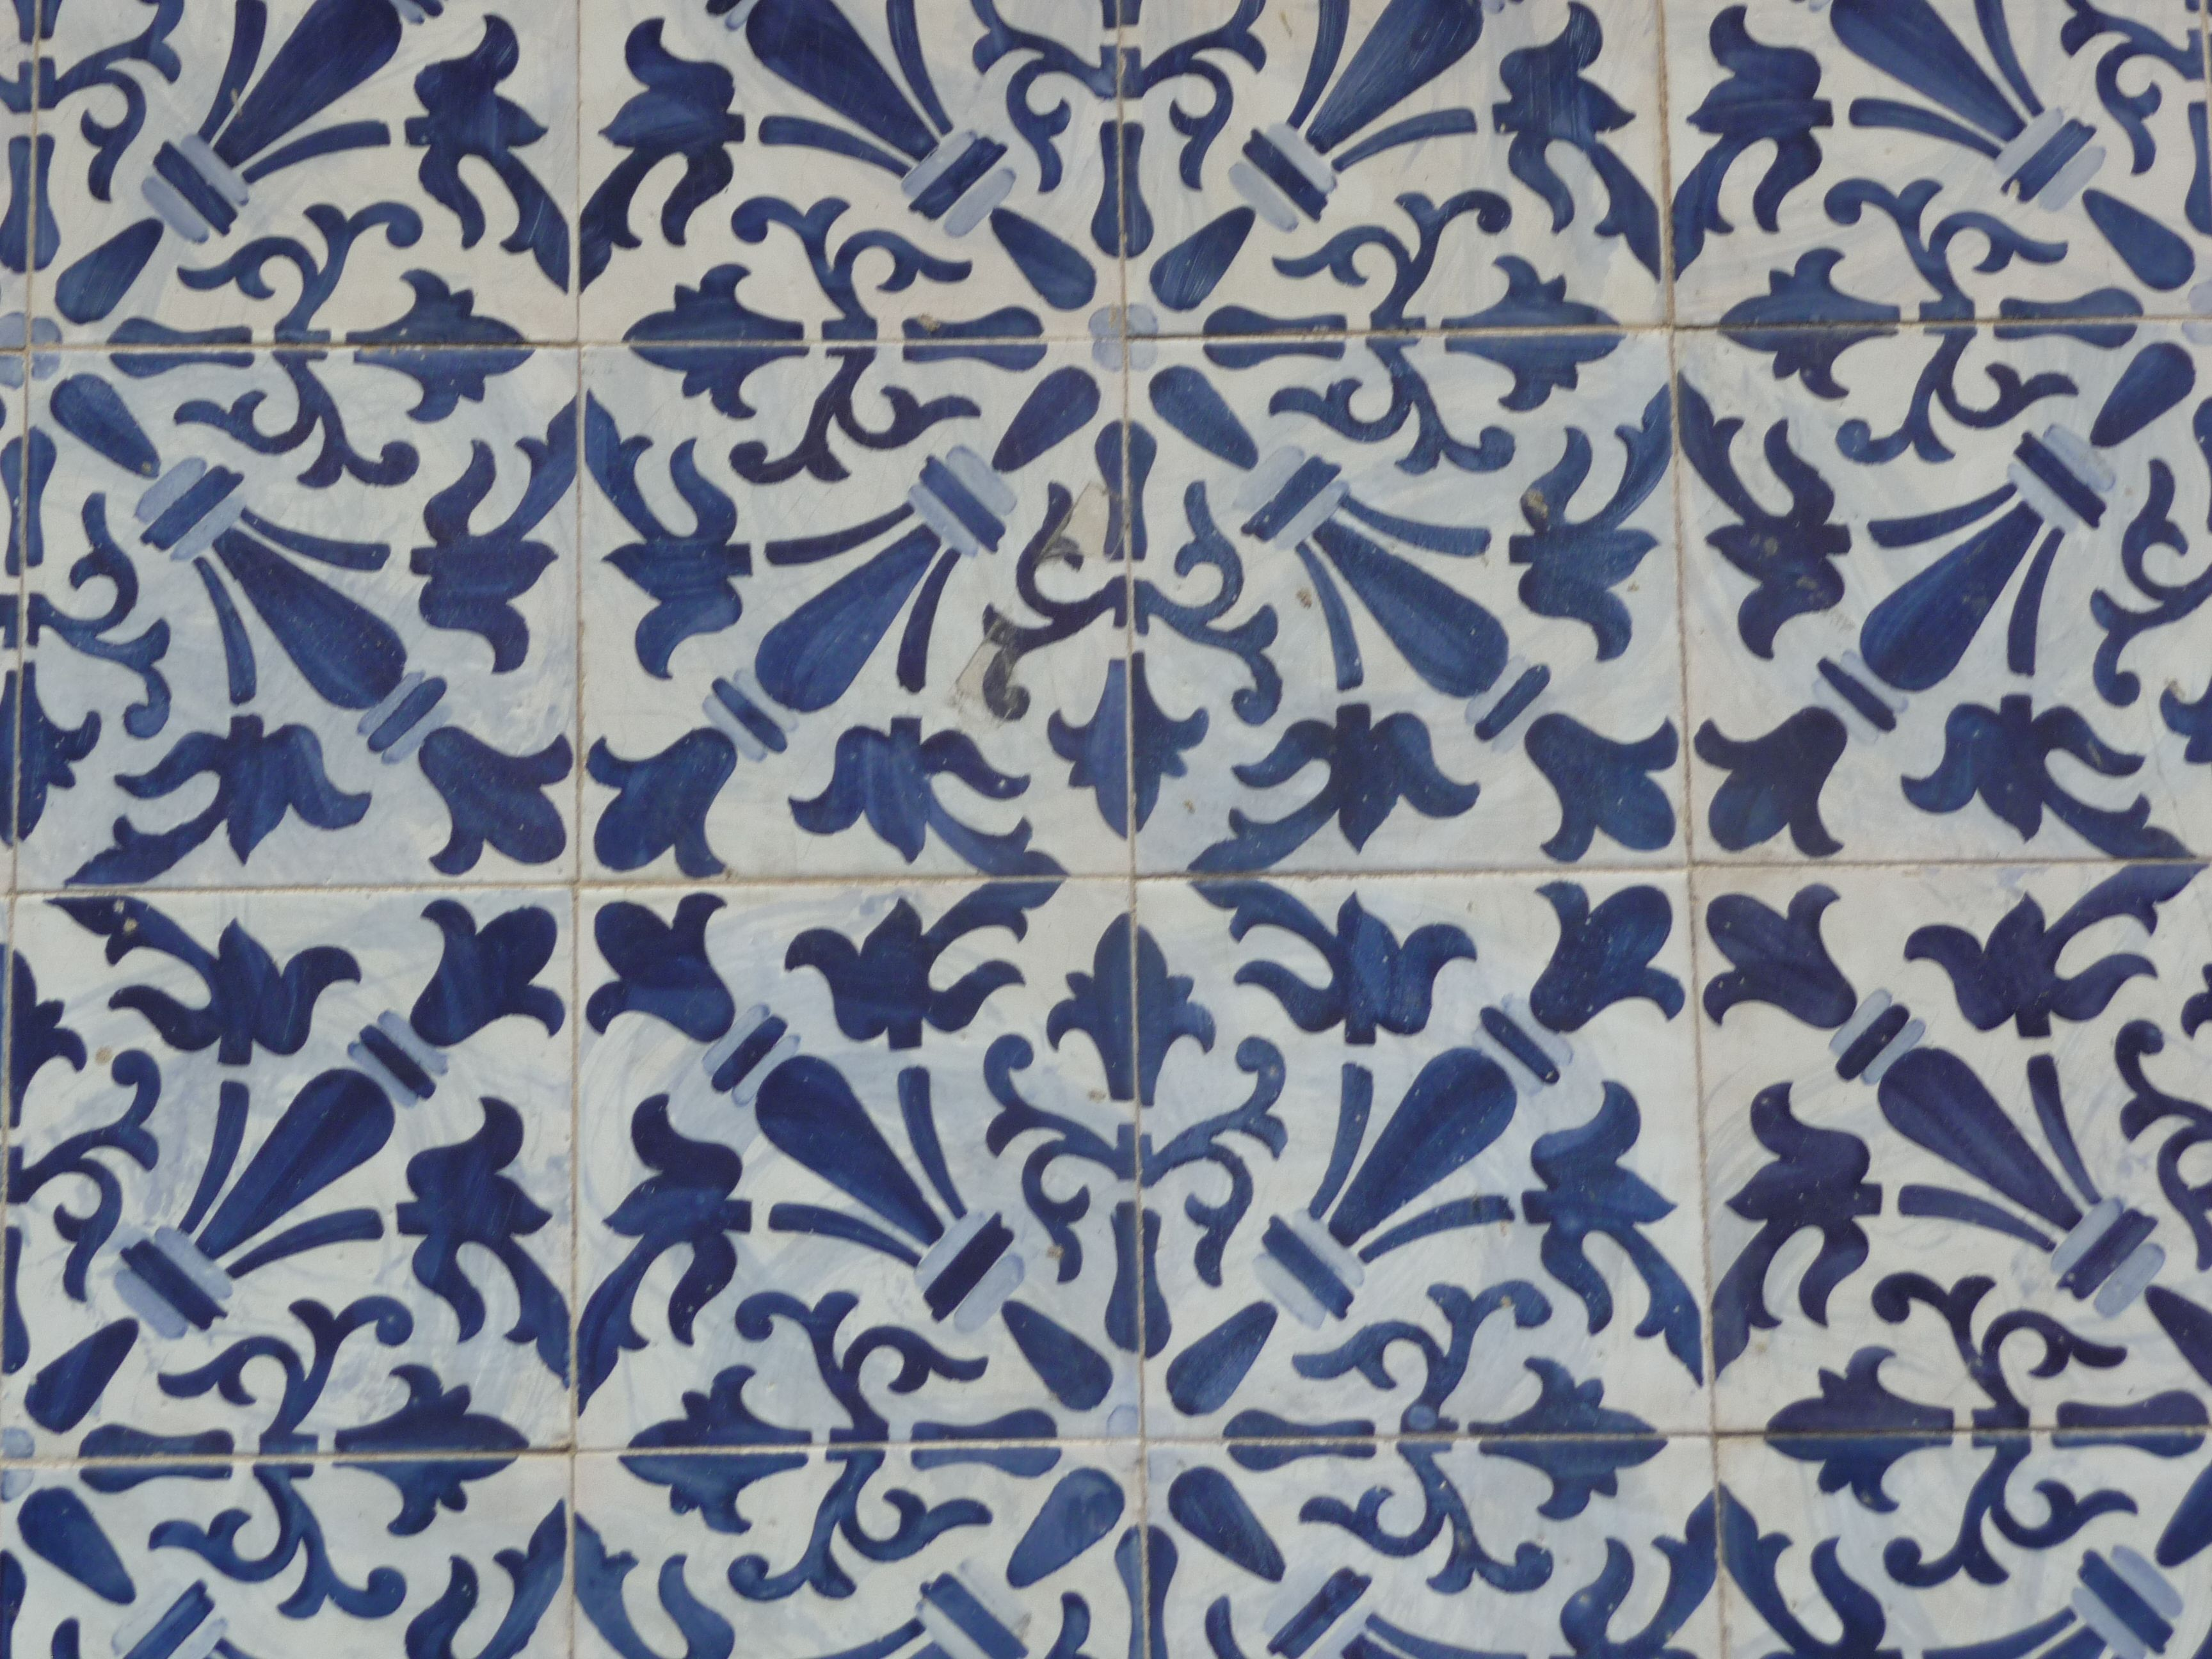 Decorative ceramic tiles \'azulejos\' of Lisbon   g l o b a l ...